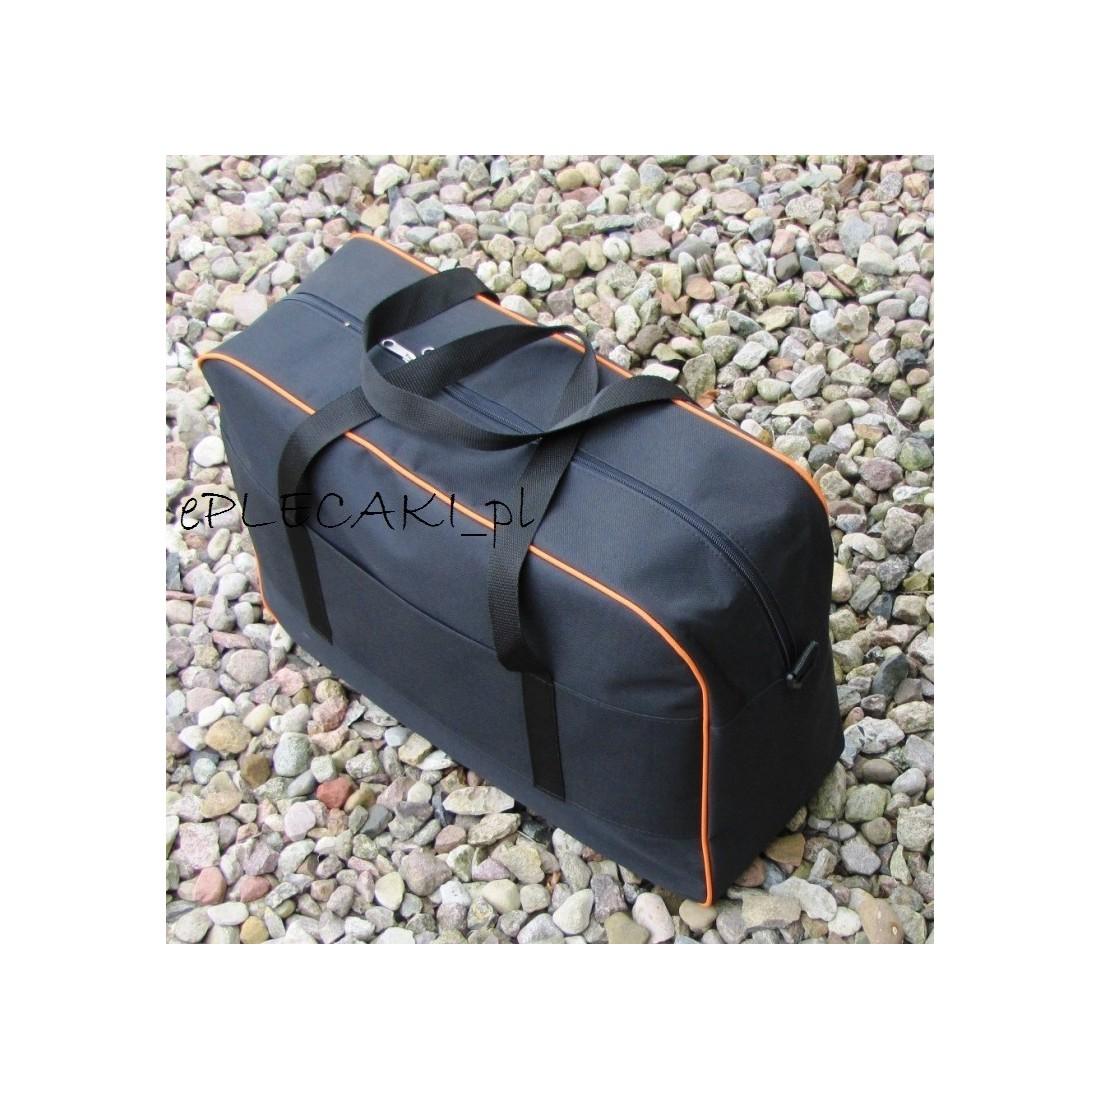 Torba - bagaż podręczny Rayanair 55x40x20cm - pomarańcz. lamówka - plecak-tornister.pl